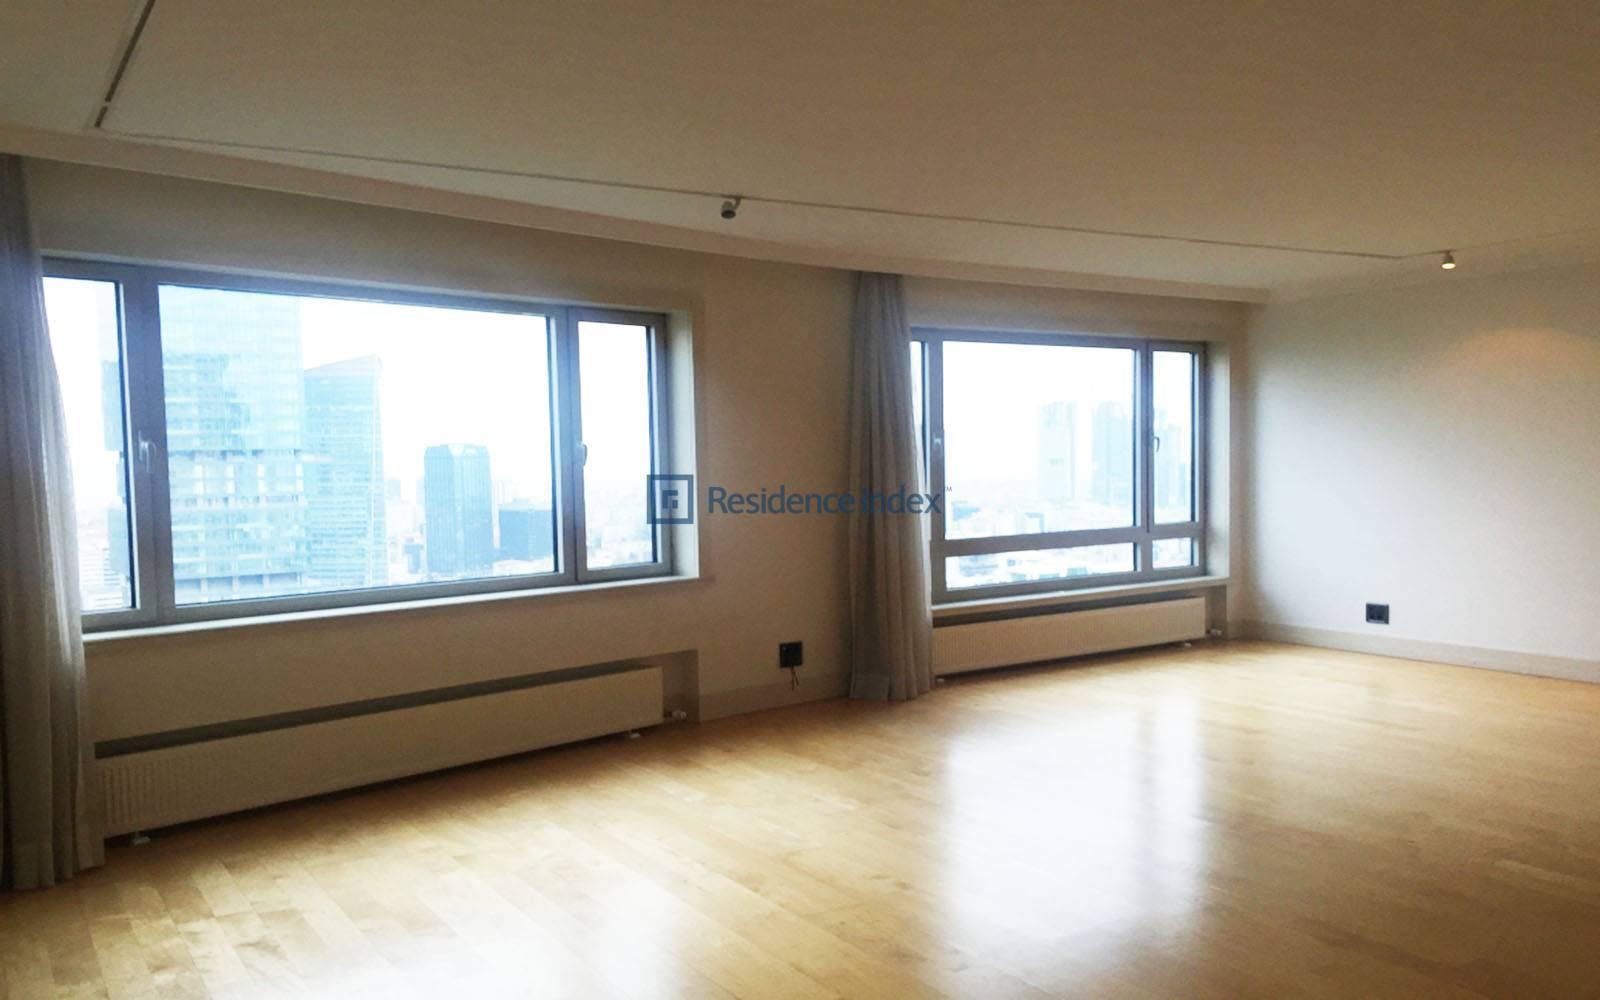 MetroCity - 2+1 apartment for rent